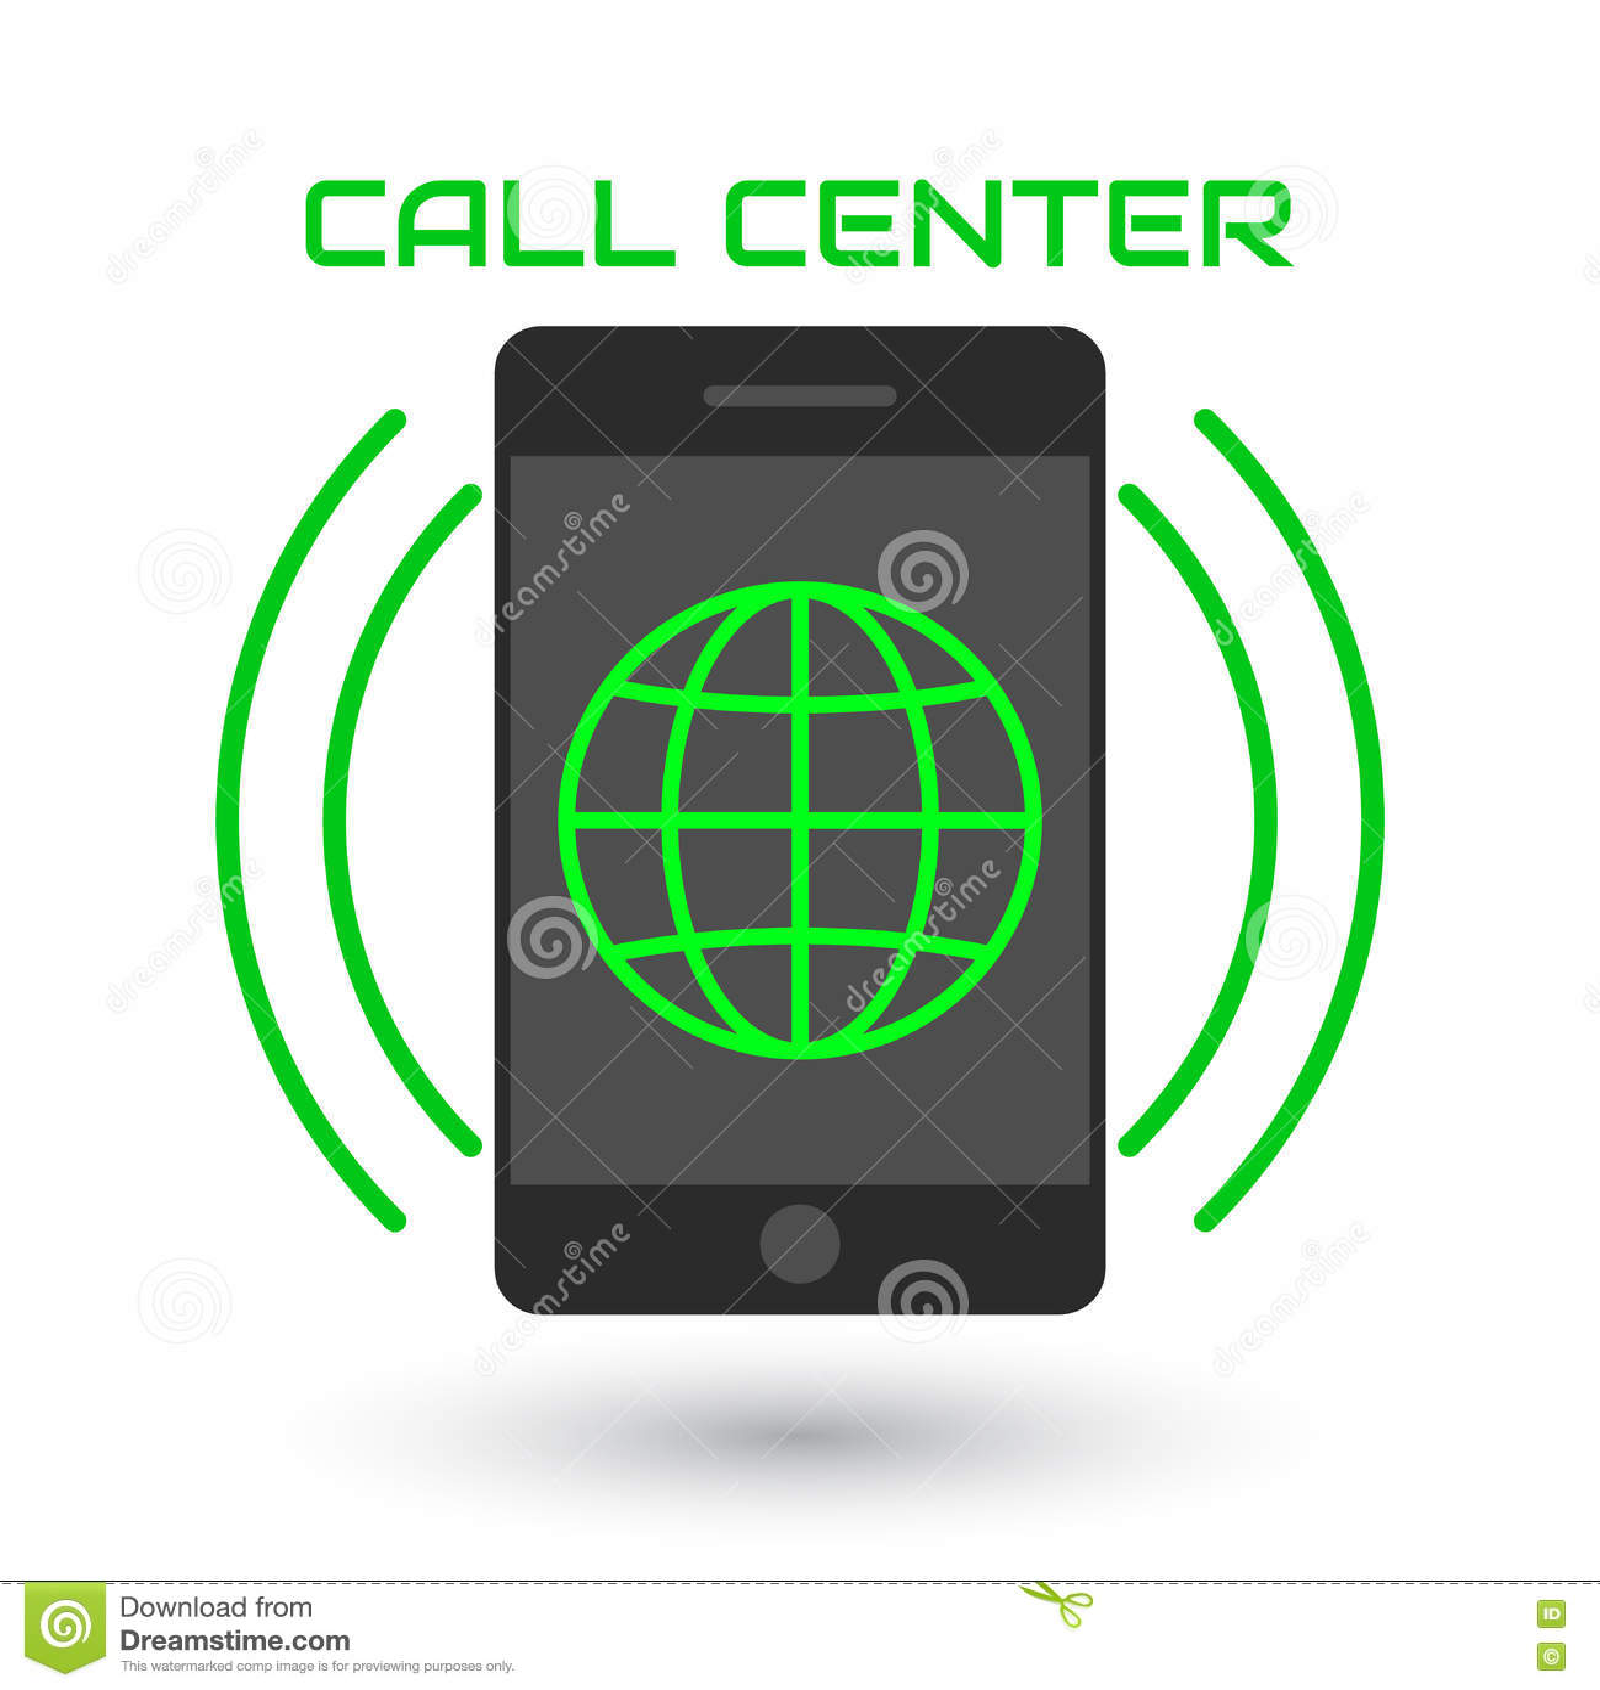 how to call globe customer service using smart